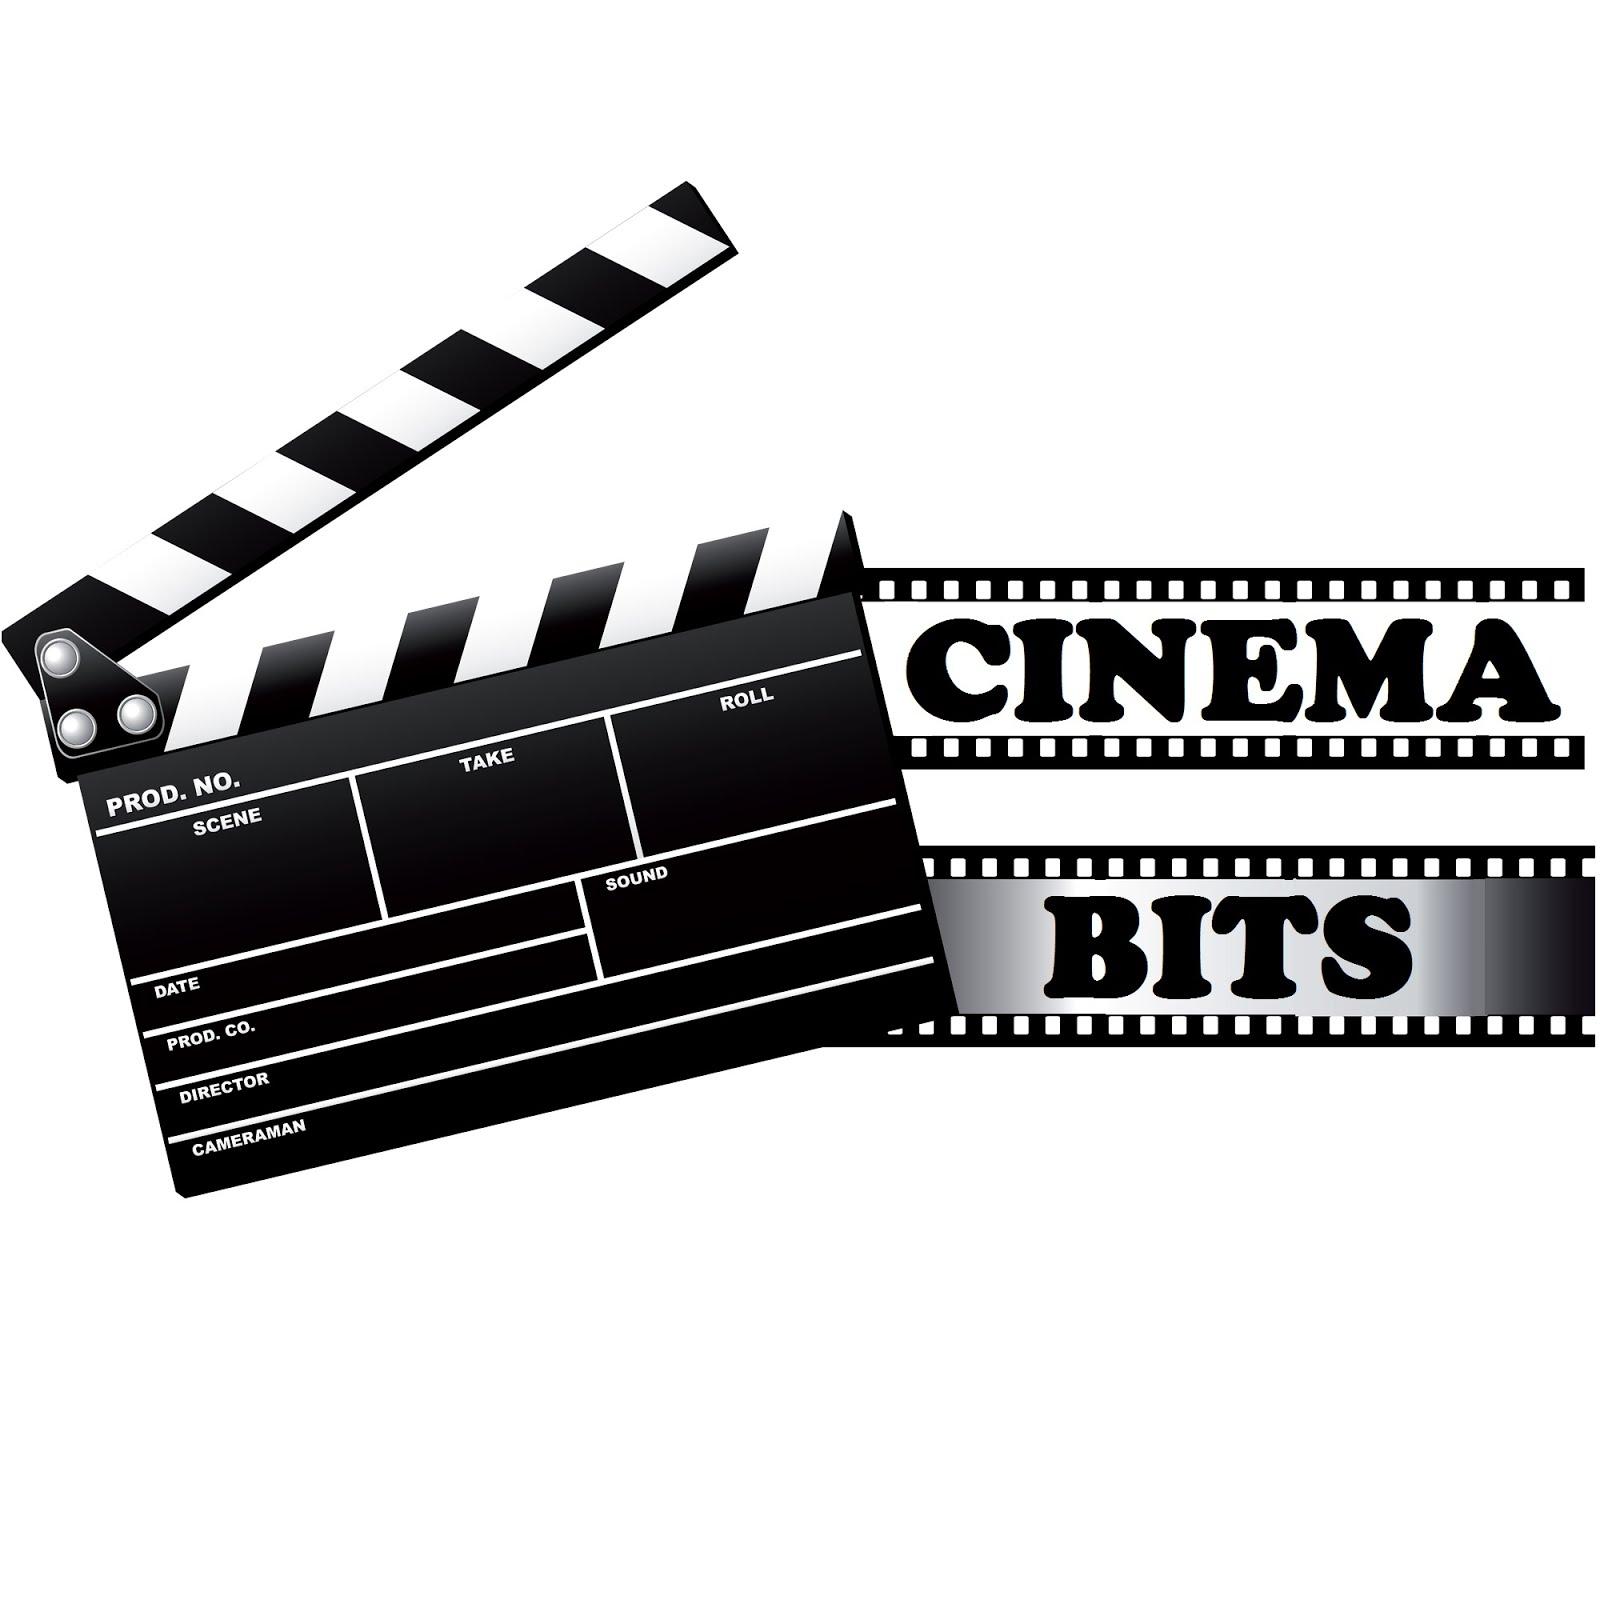 Cineman Bits